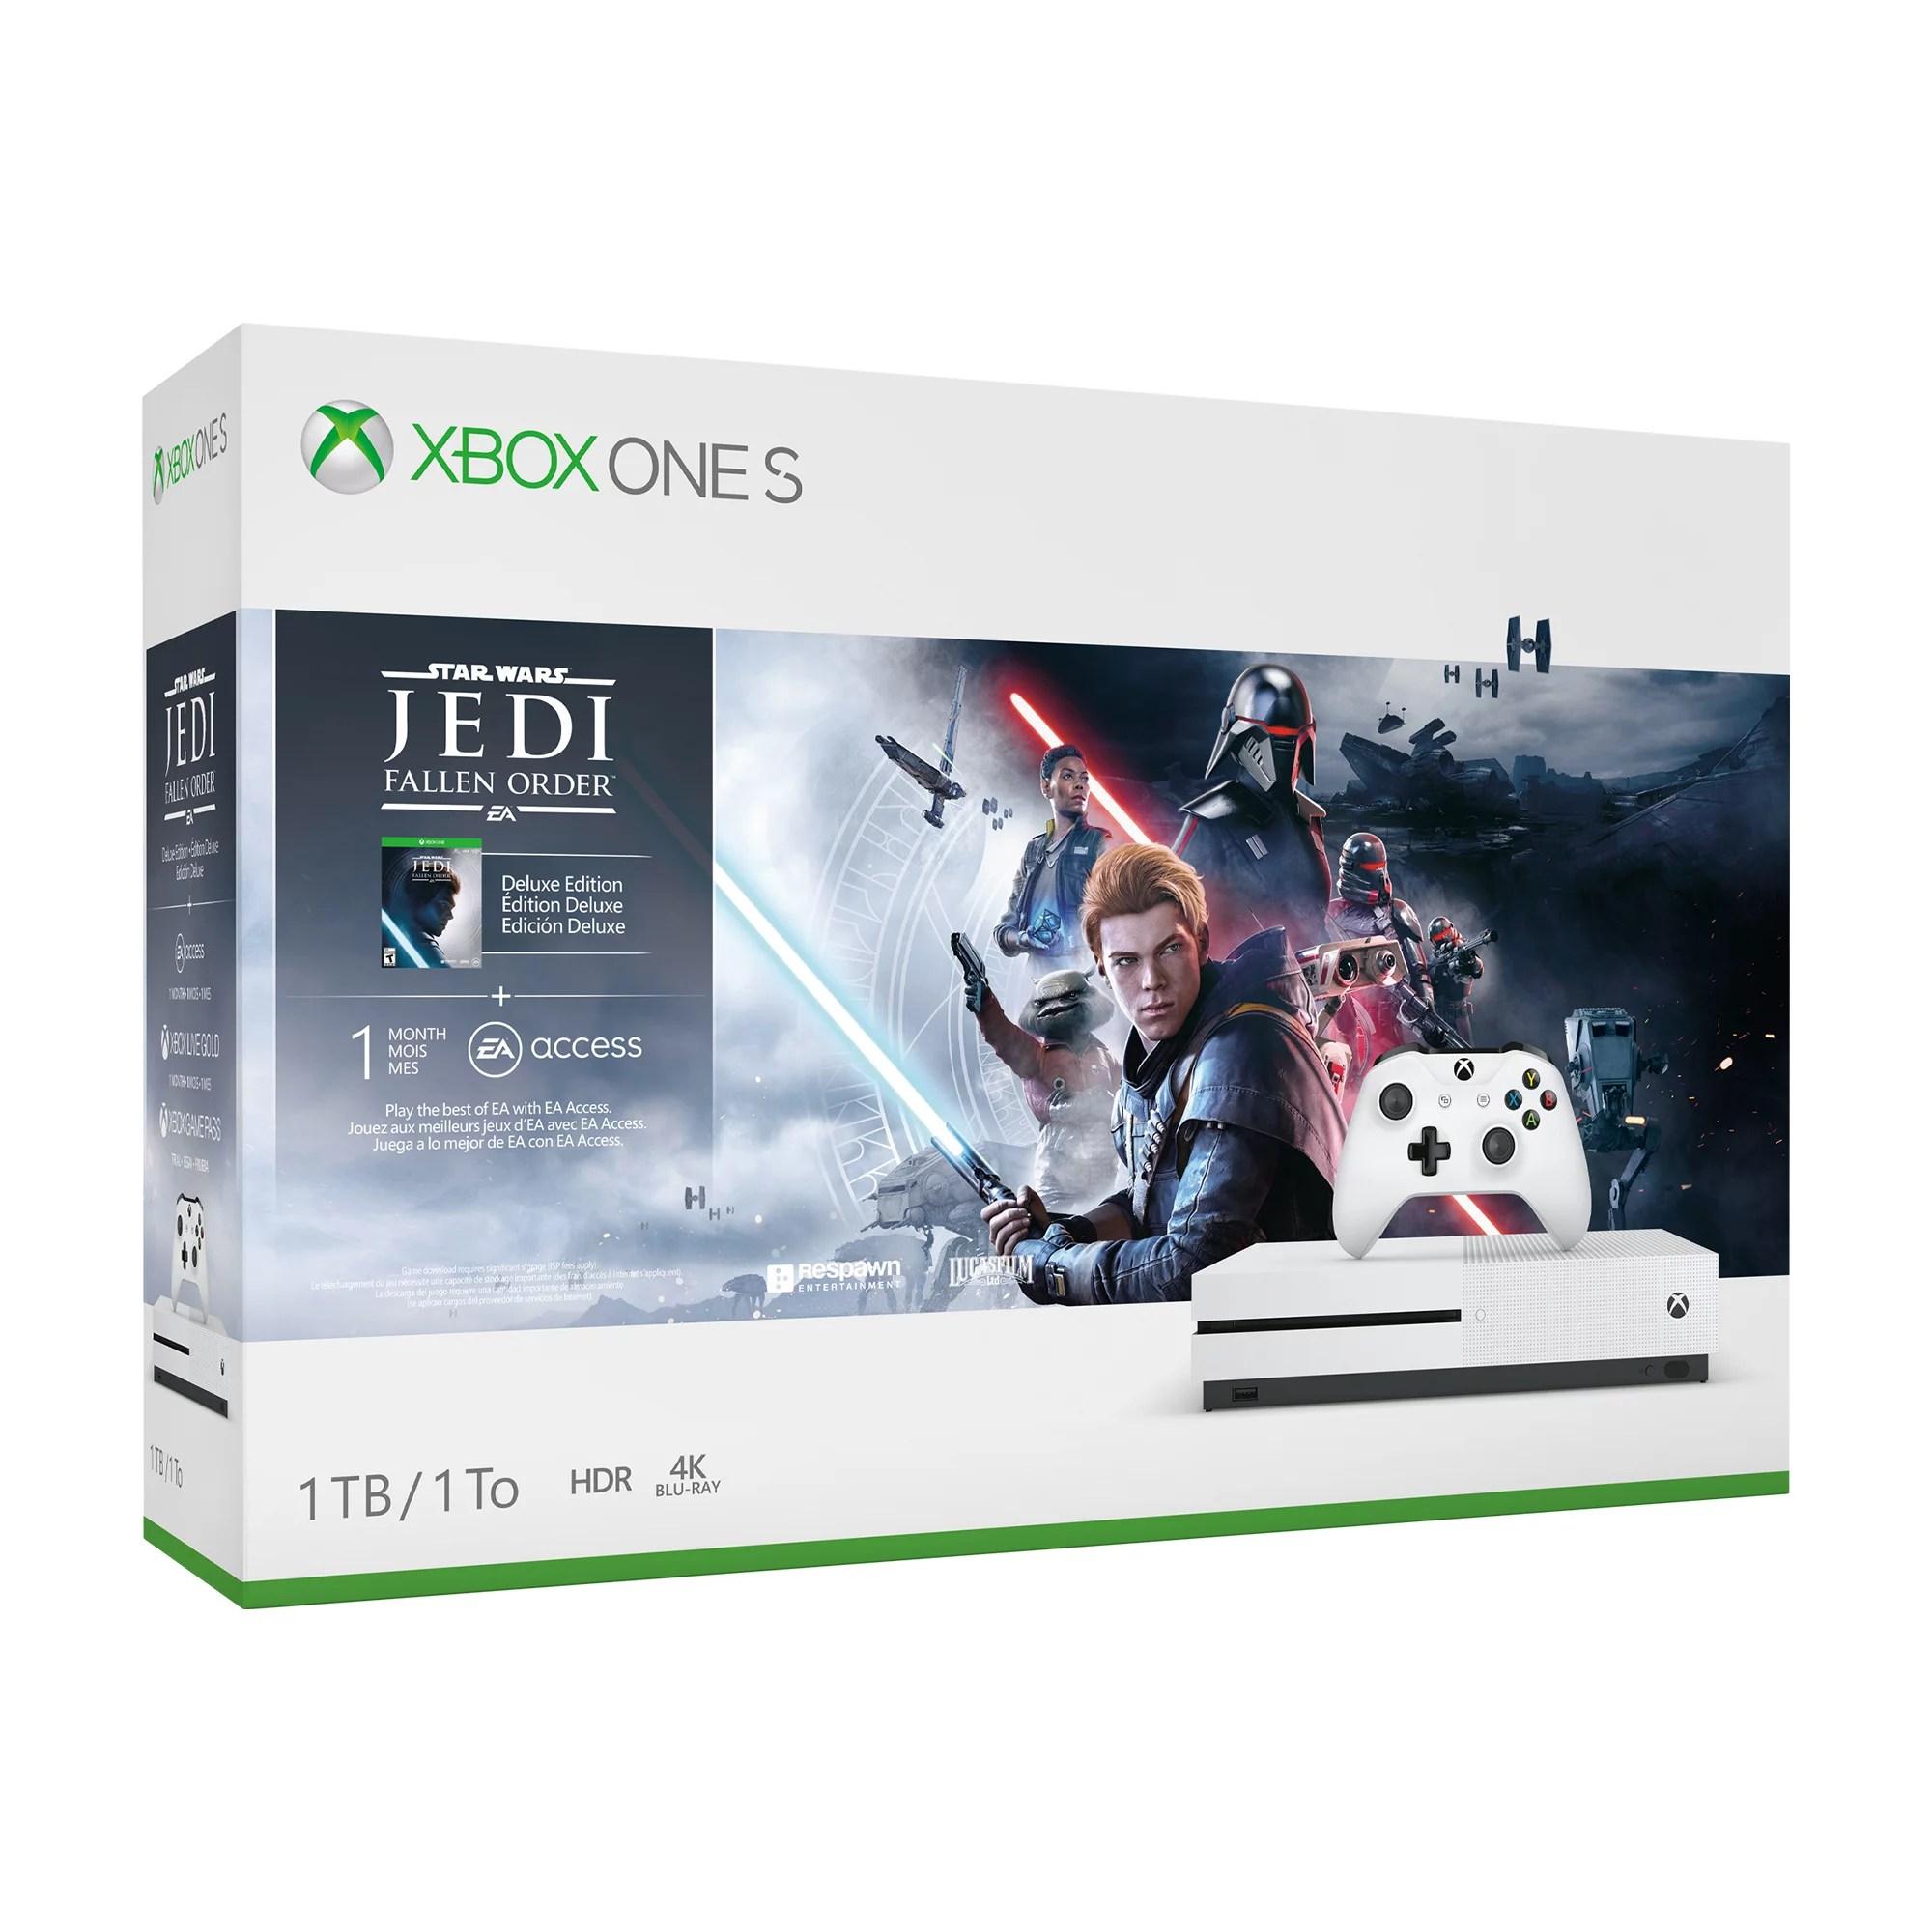 Microsoft Xbox One S 1TB Star Wars Jedi: Fallen Order Console Bundle, White, 234-01089